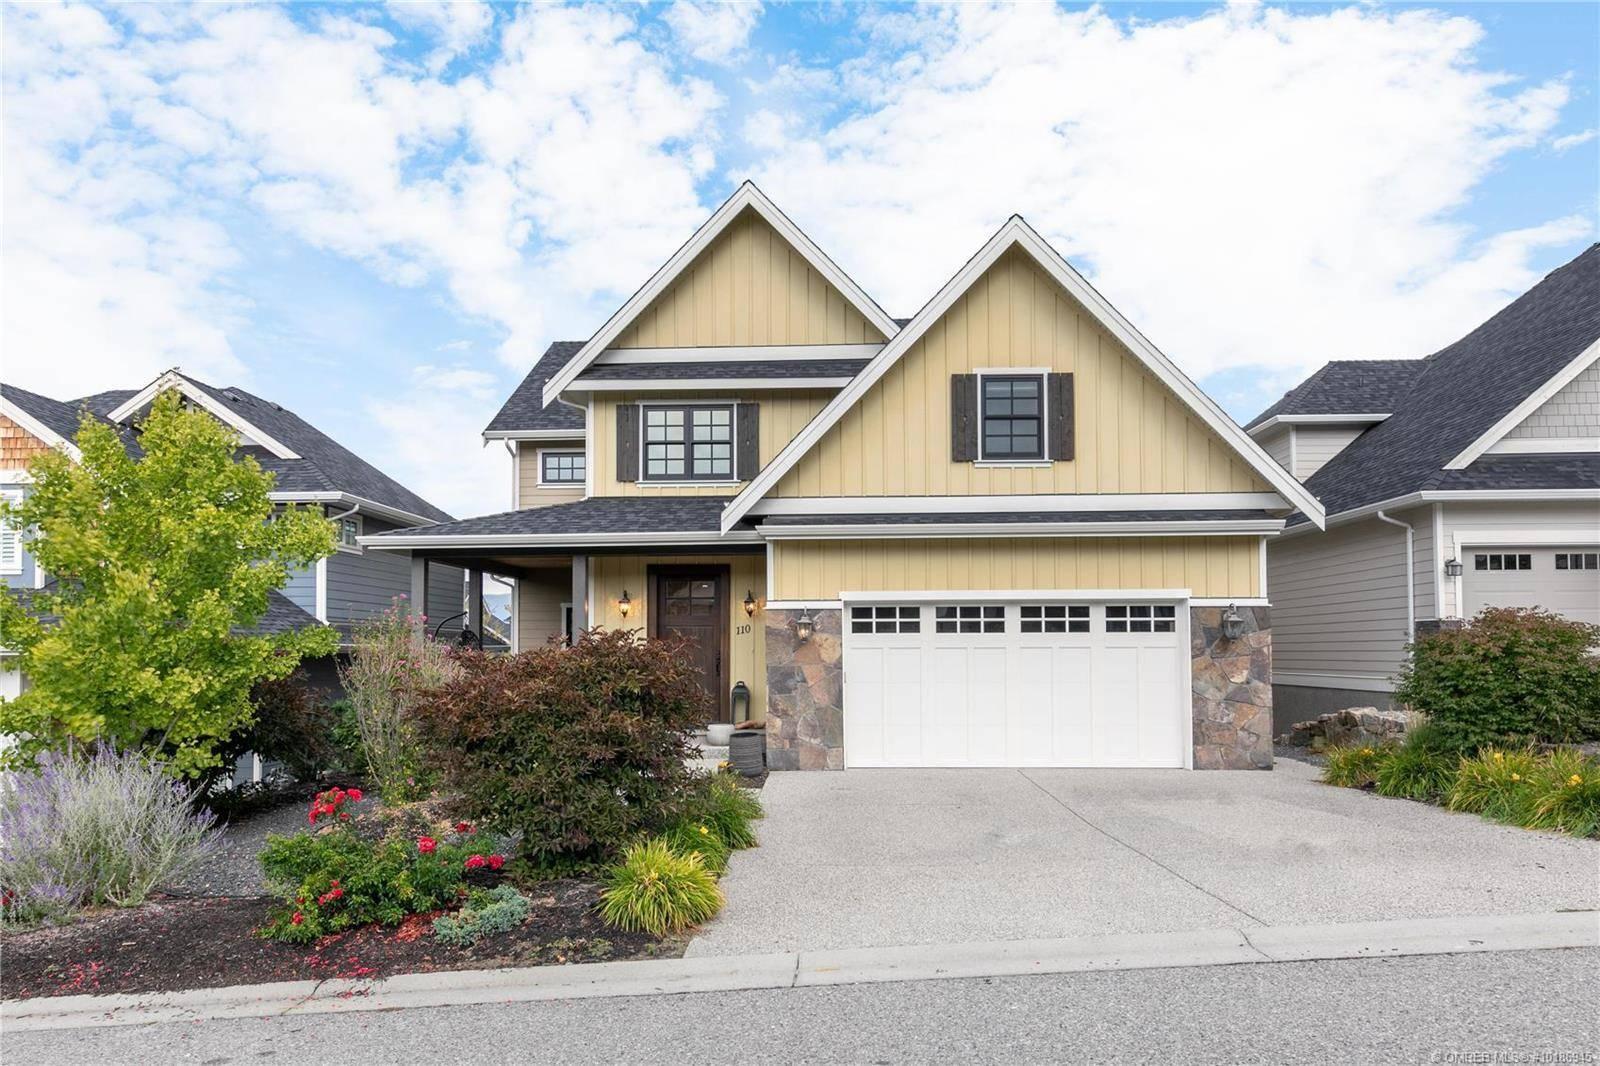 House for sale at 515 Wren Pl Unit 110 Kelowna British Columbia - MLS: 10186945